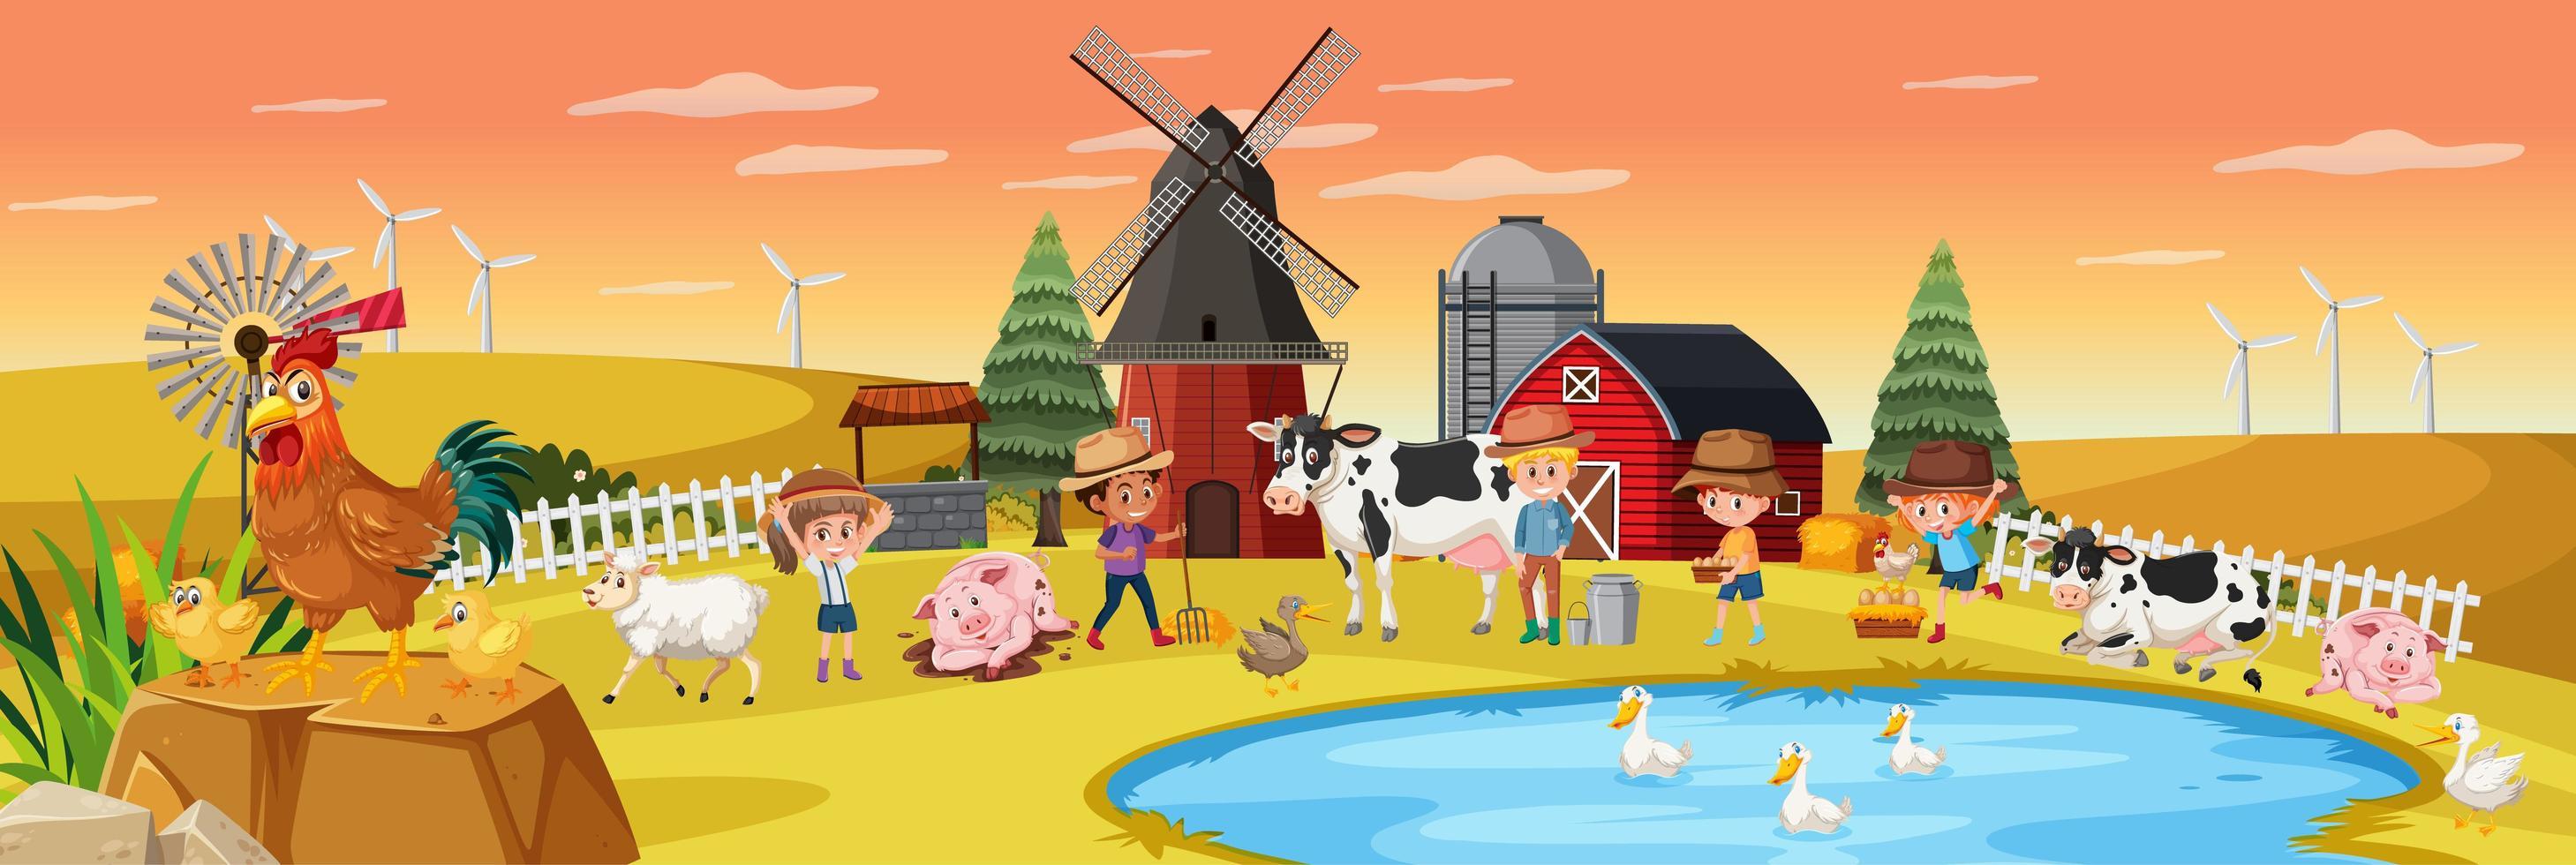 Happy children at the farm vector